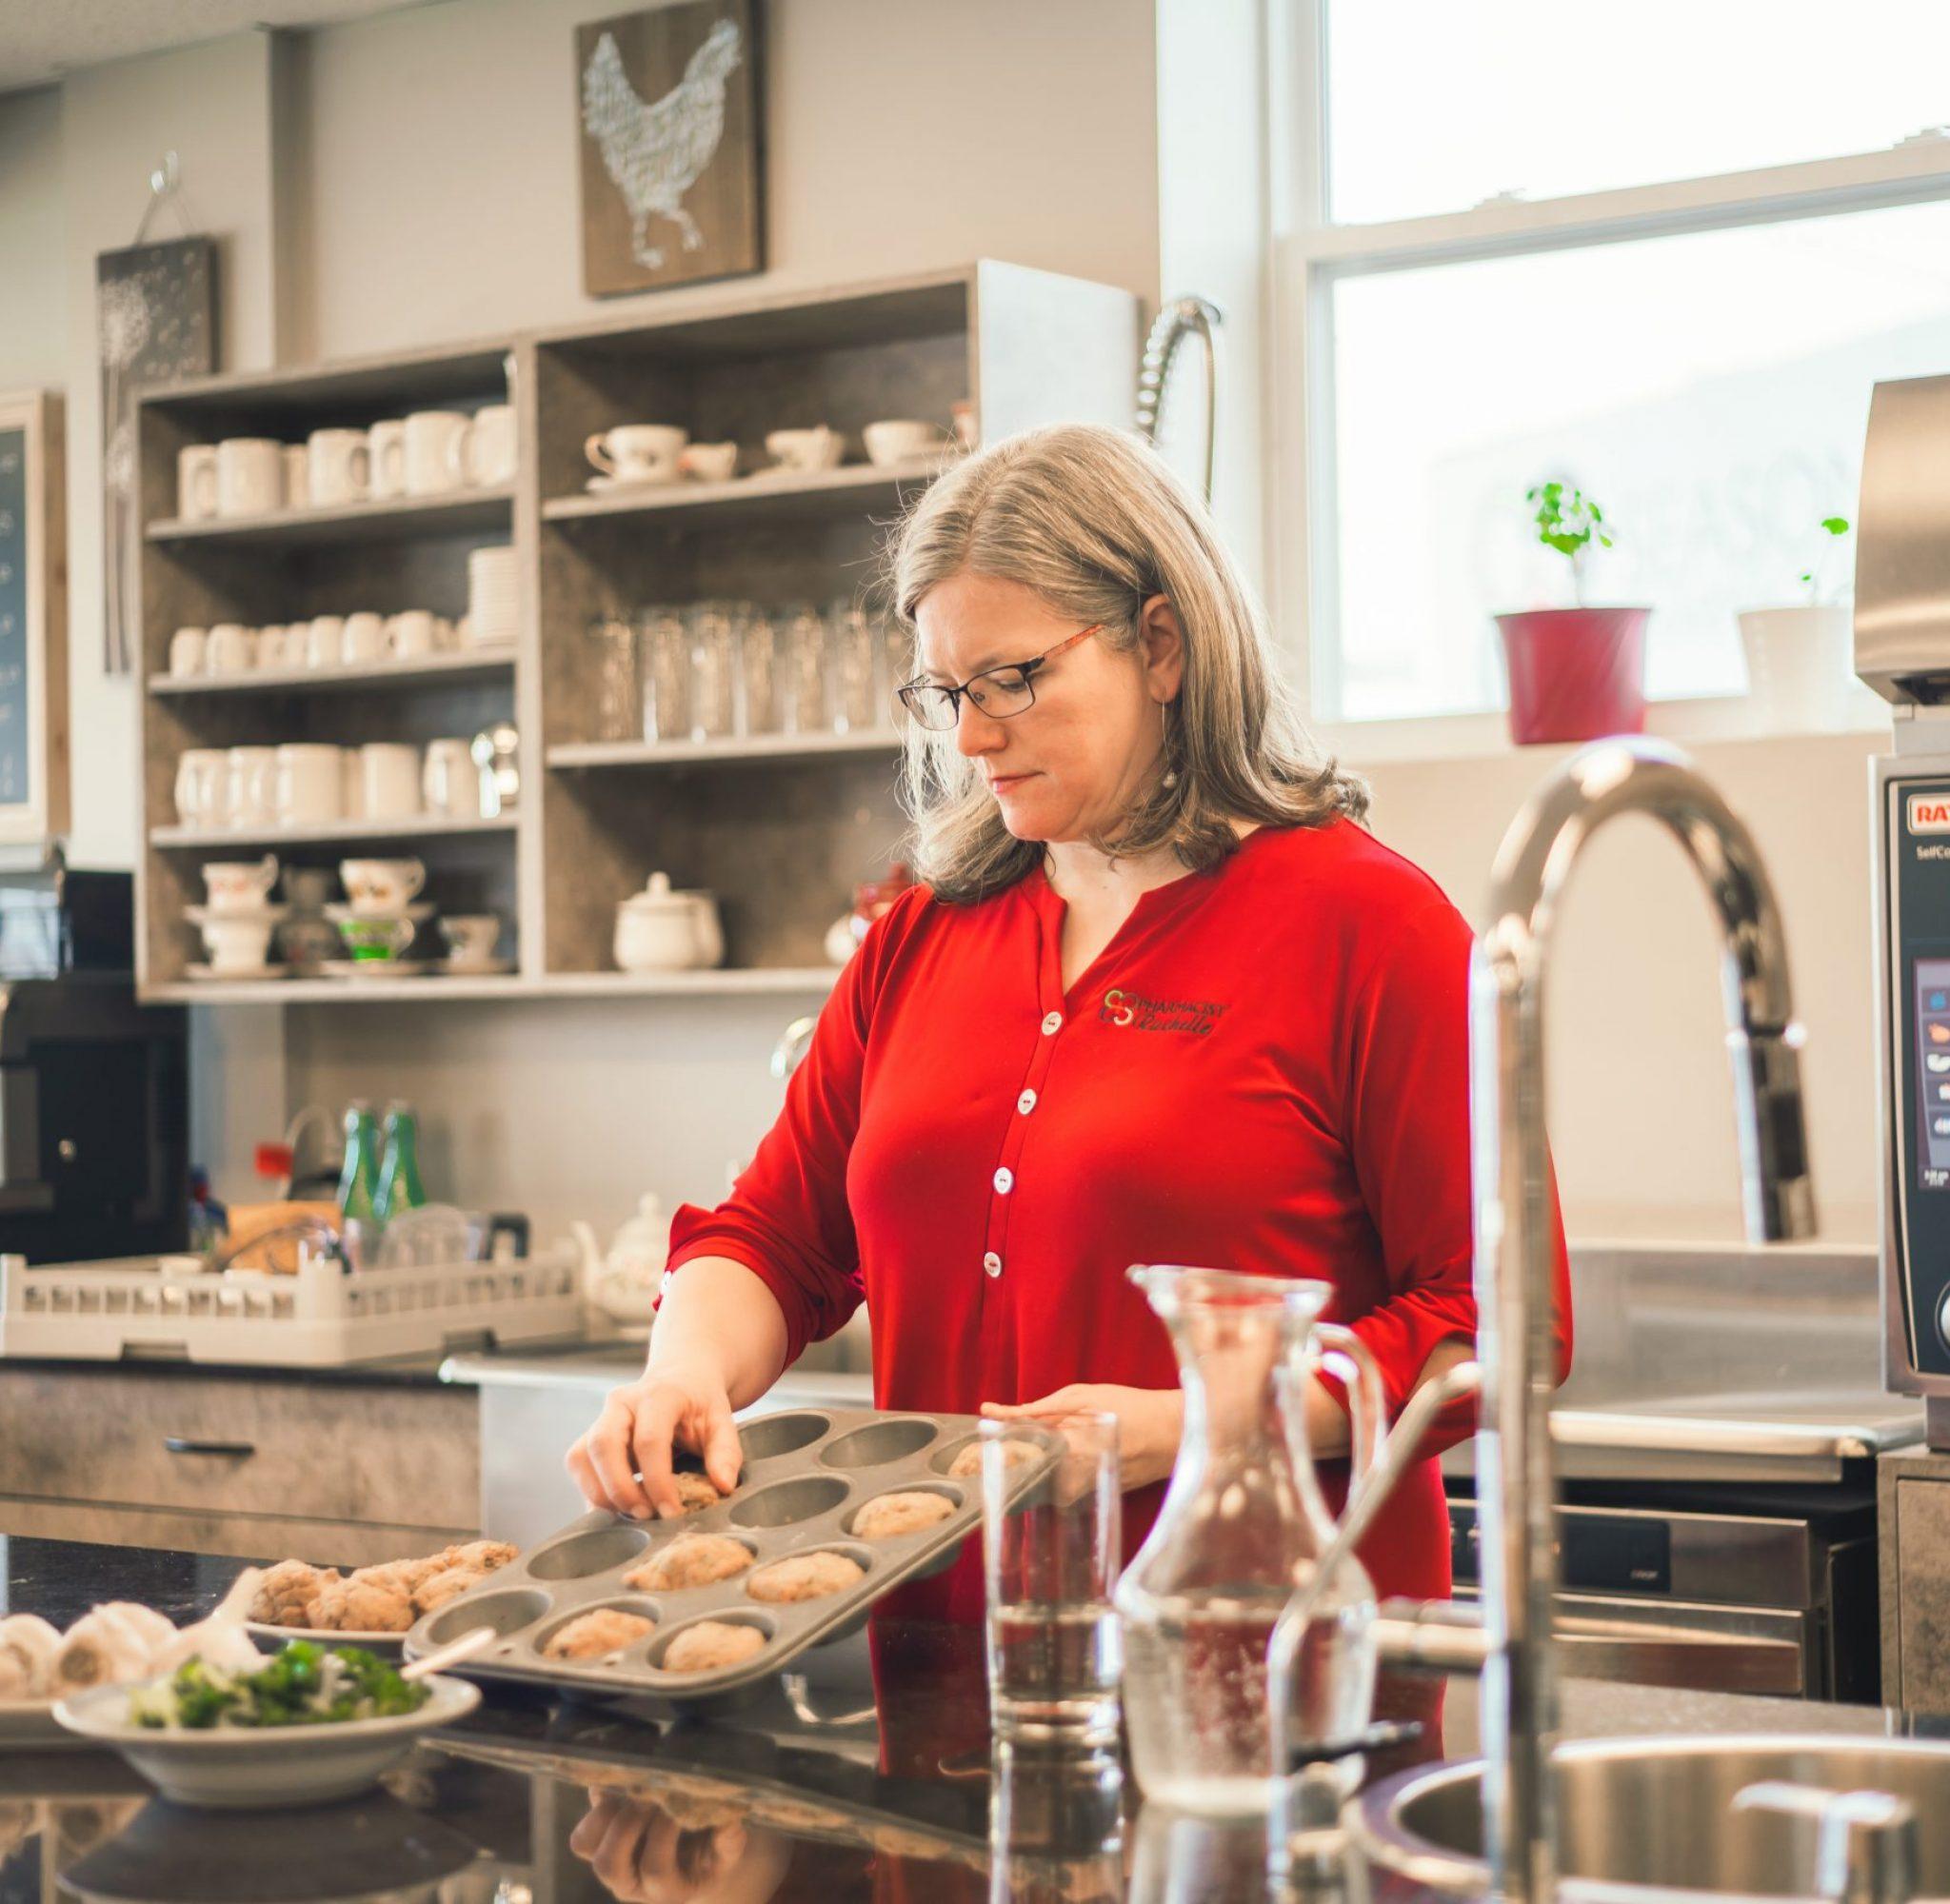 Rechalle in the kitchen preparing organic food